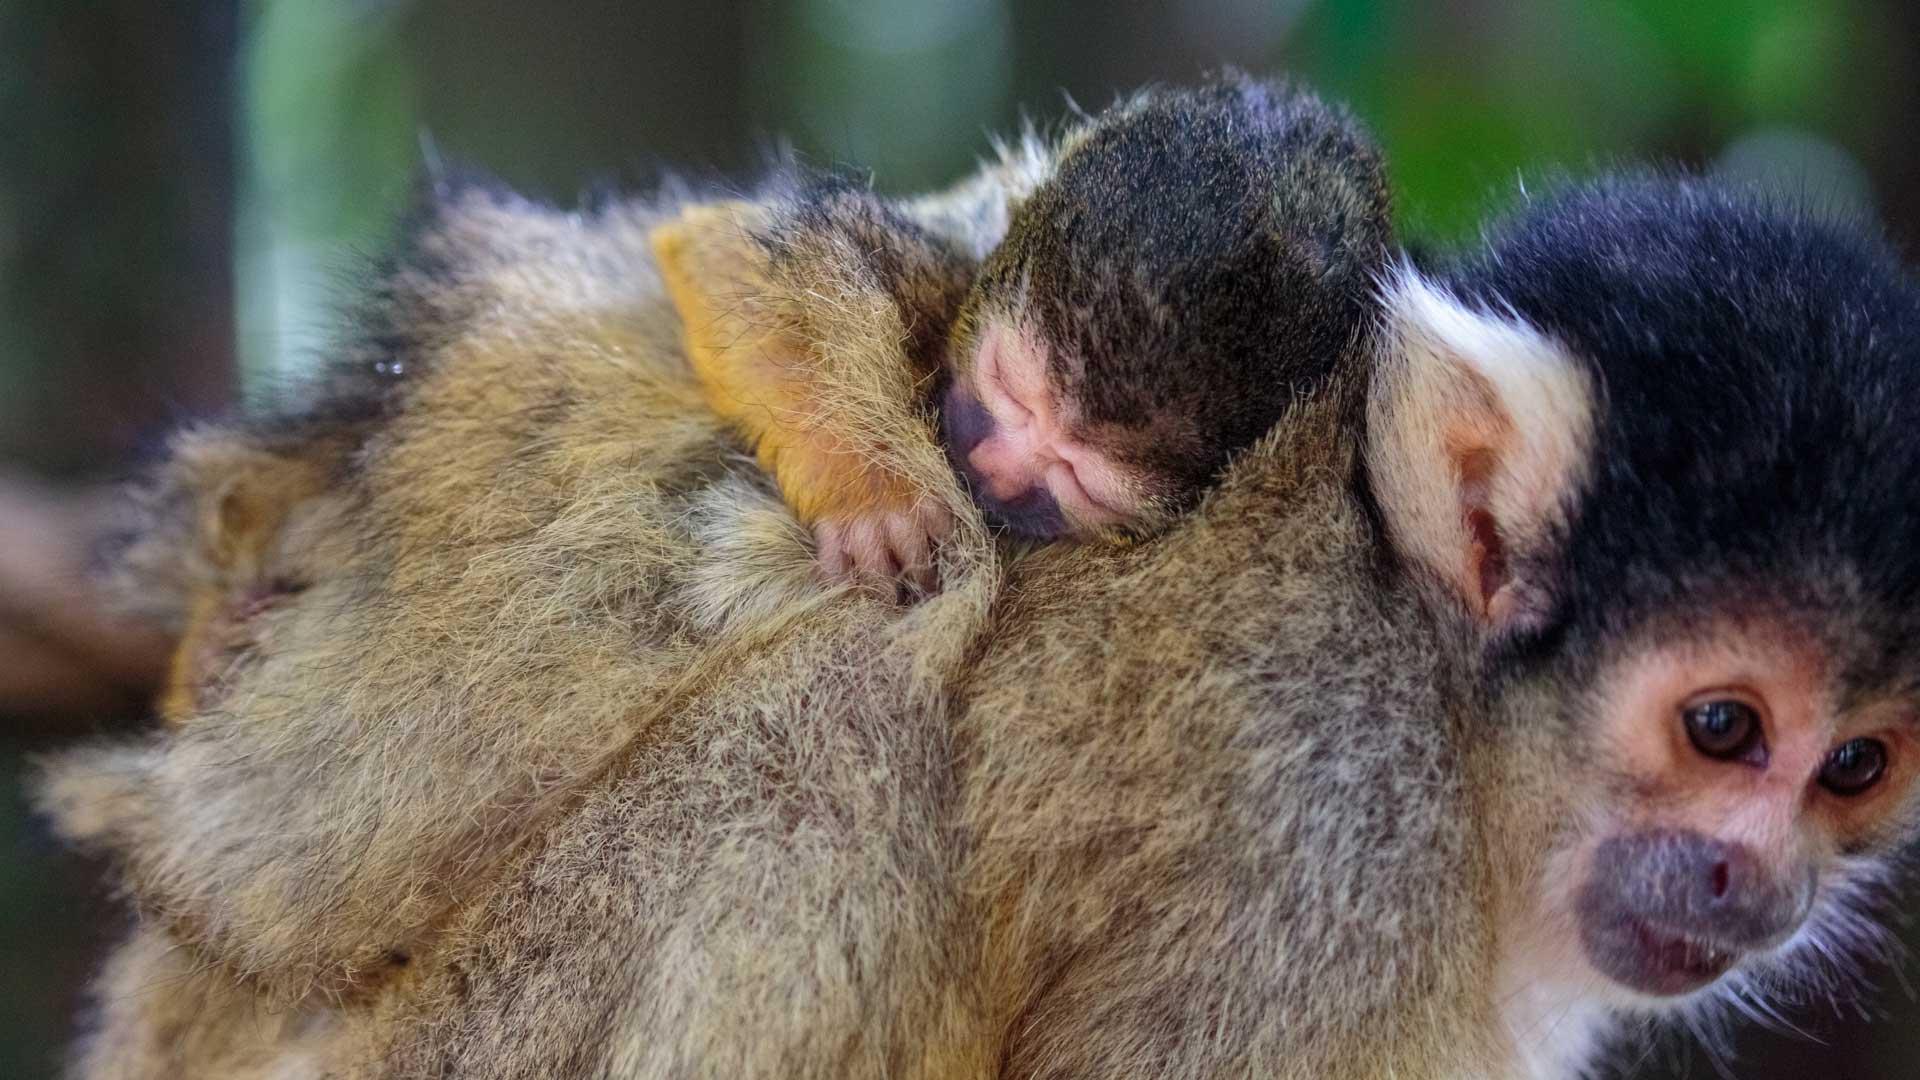 https://rfacdn.nz/zoo/assets/media/squirrel-monkey-picaro-gallery-3.jpg